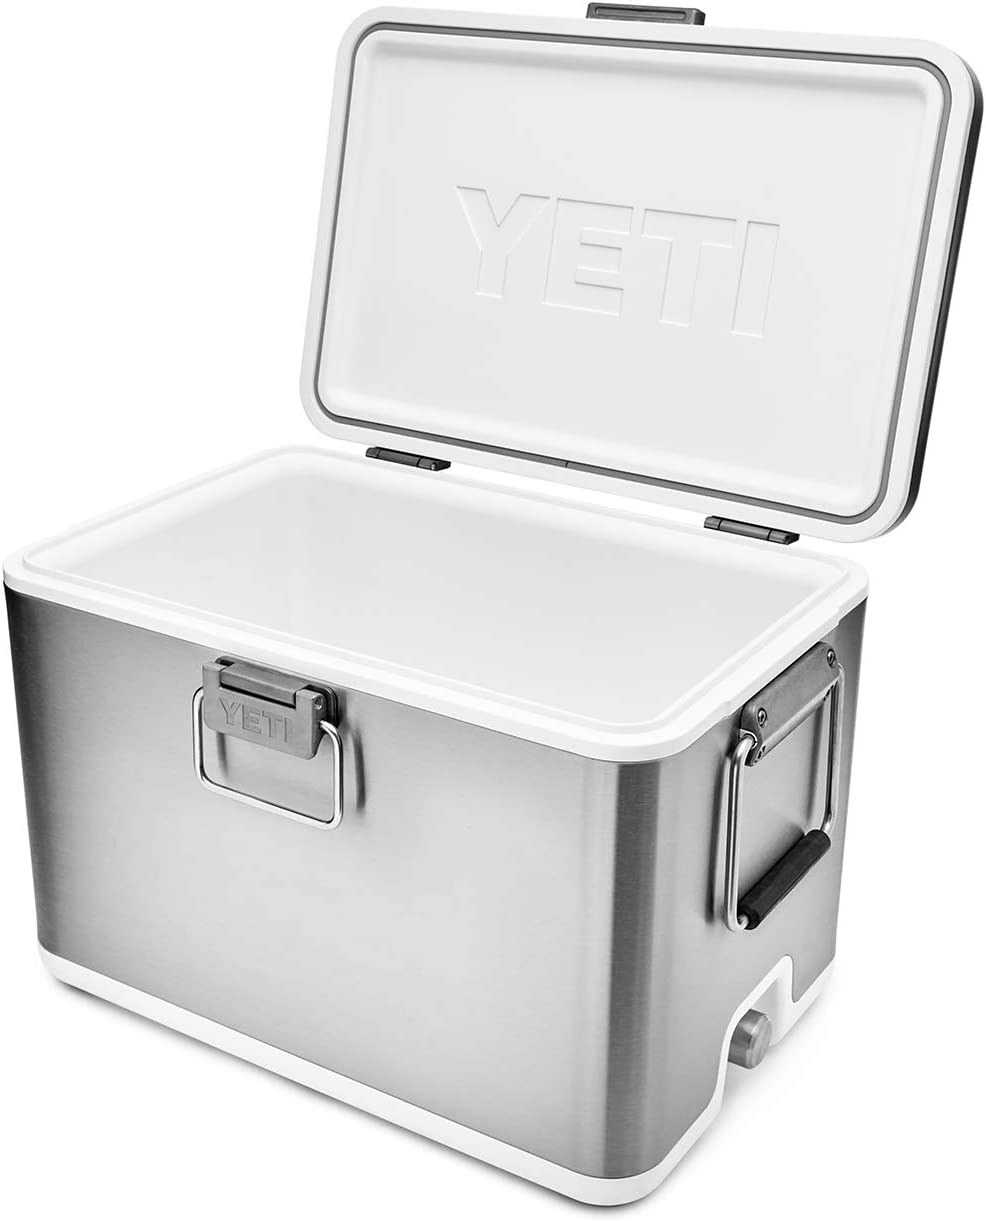 Yeti V Series Stainless Steel Vacuum Insulated Hard Cooler